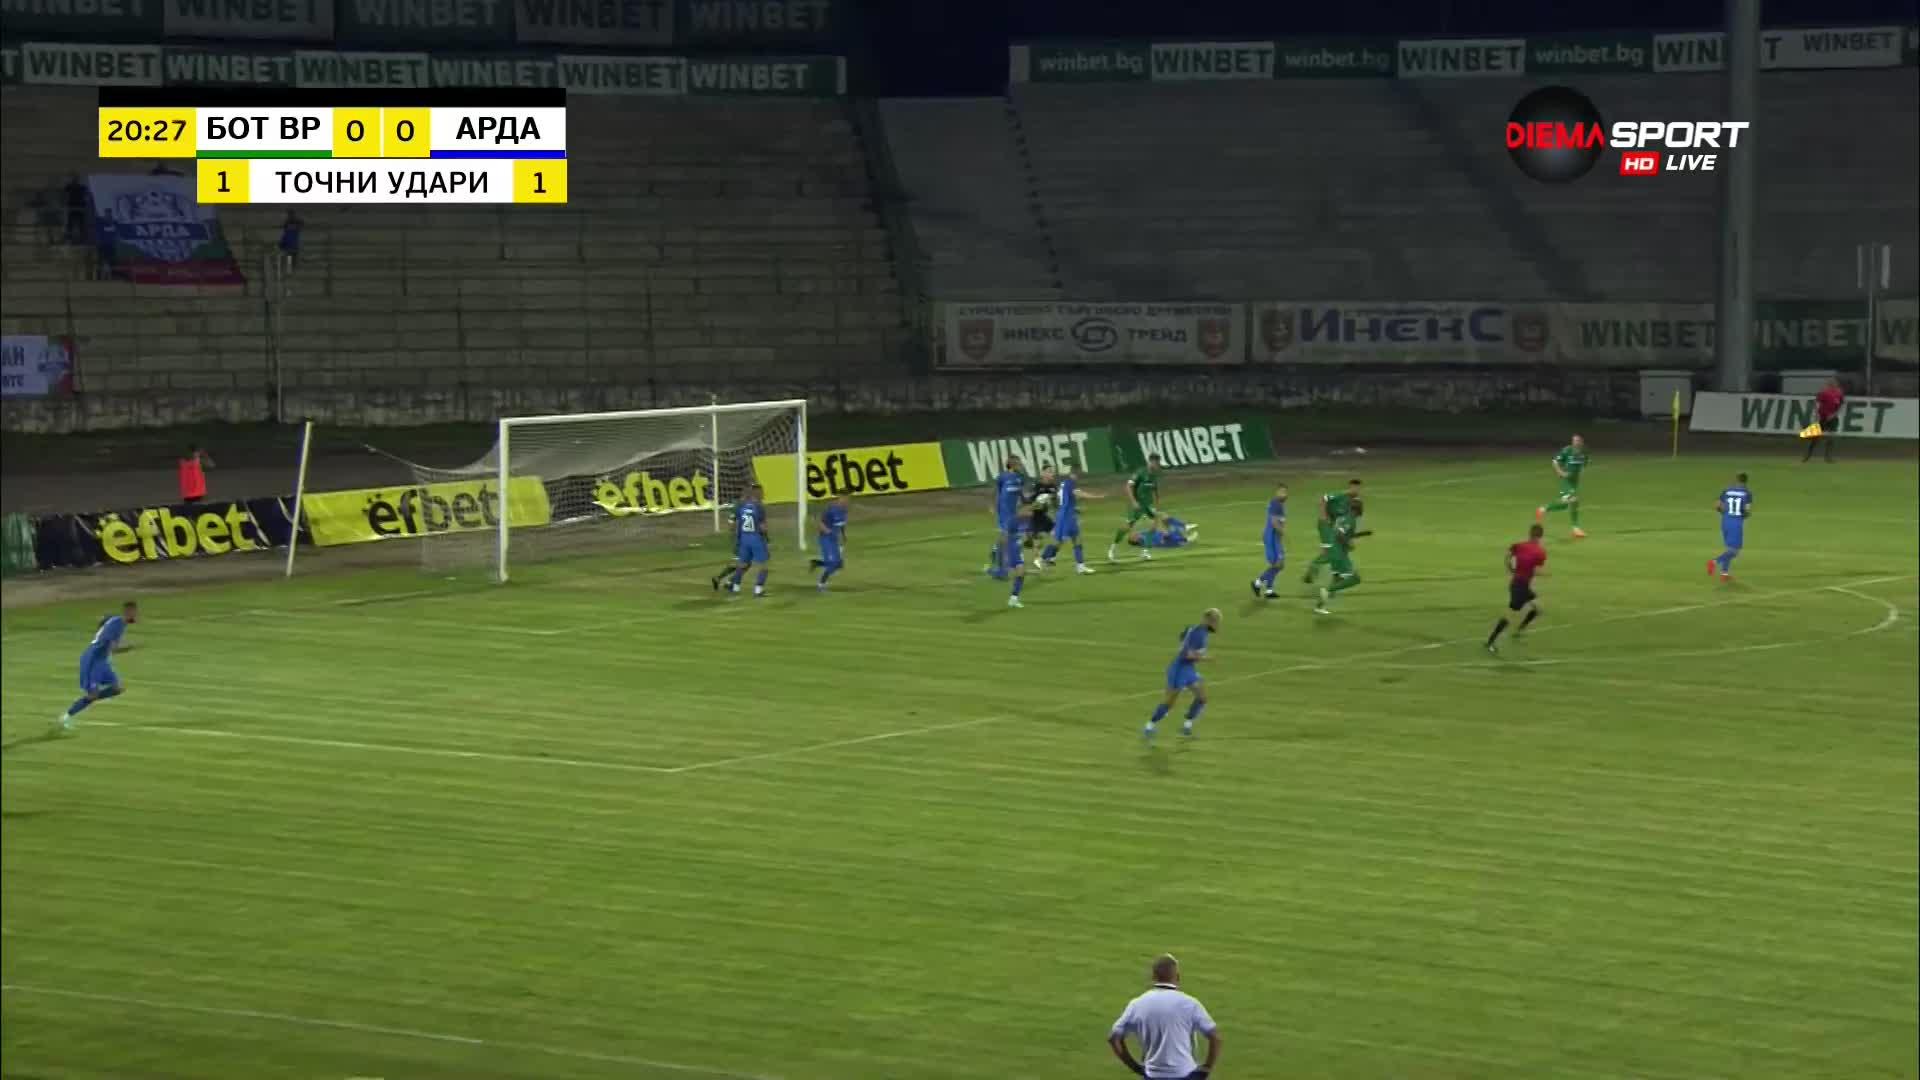 Ботев Враца - Арда 0:0 /първо полувреме/